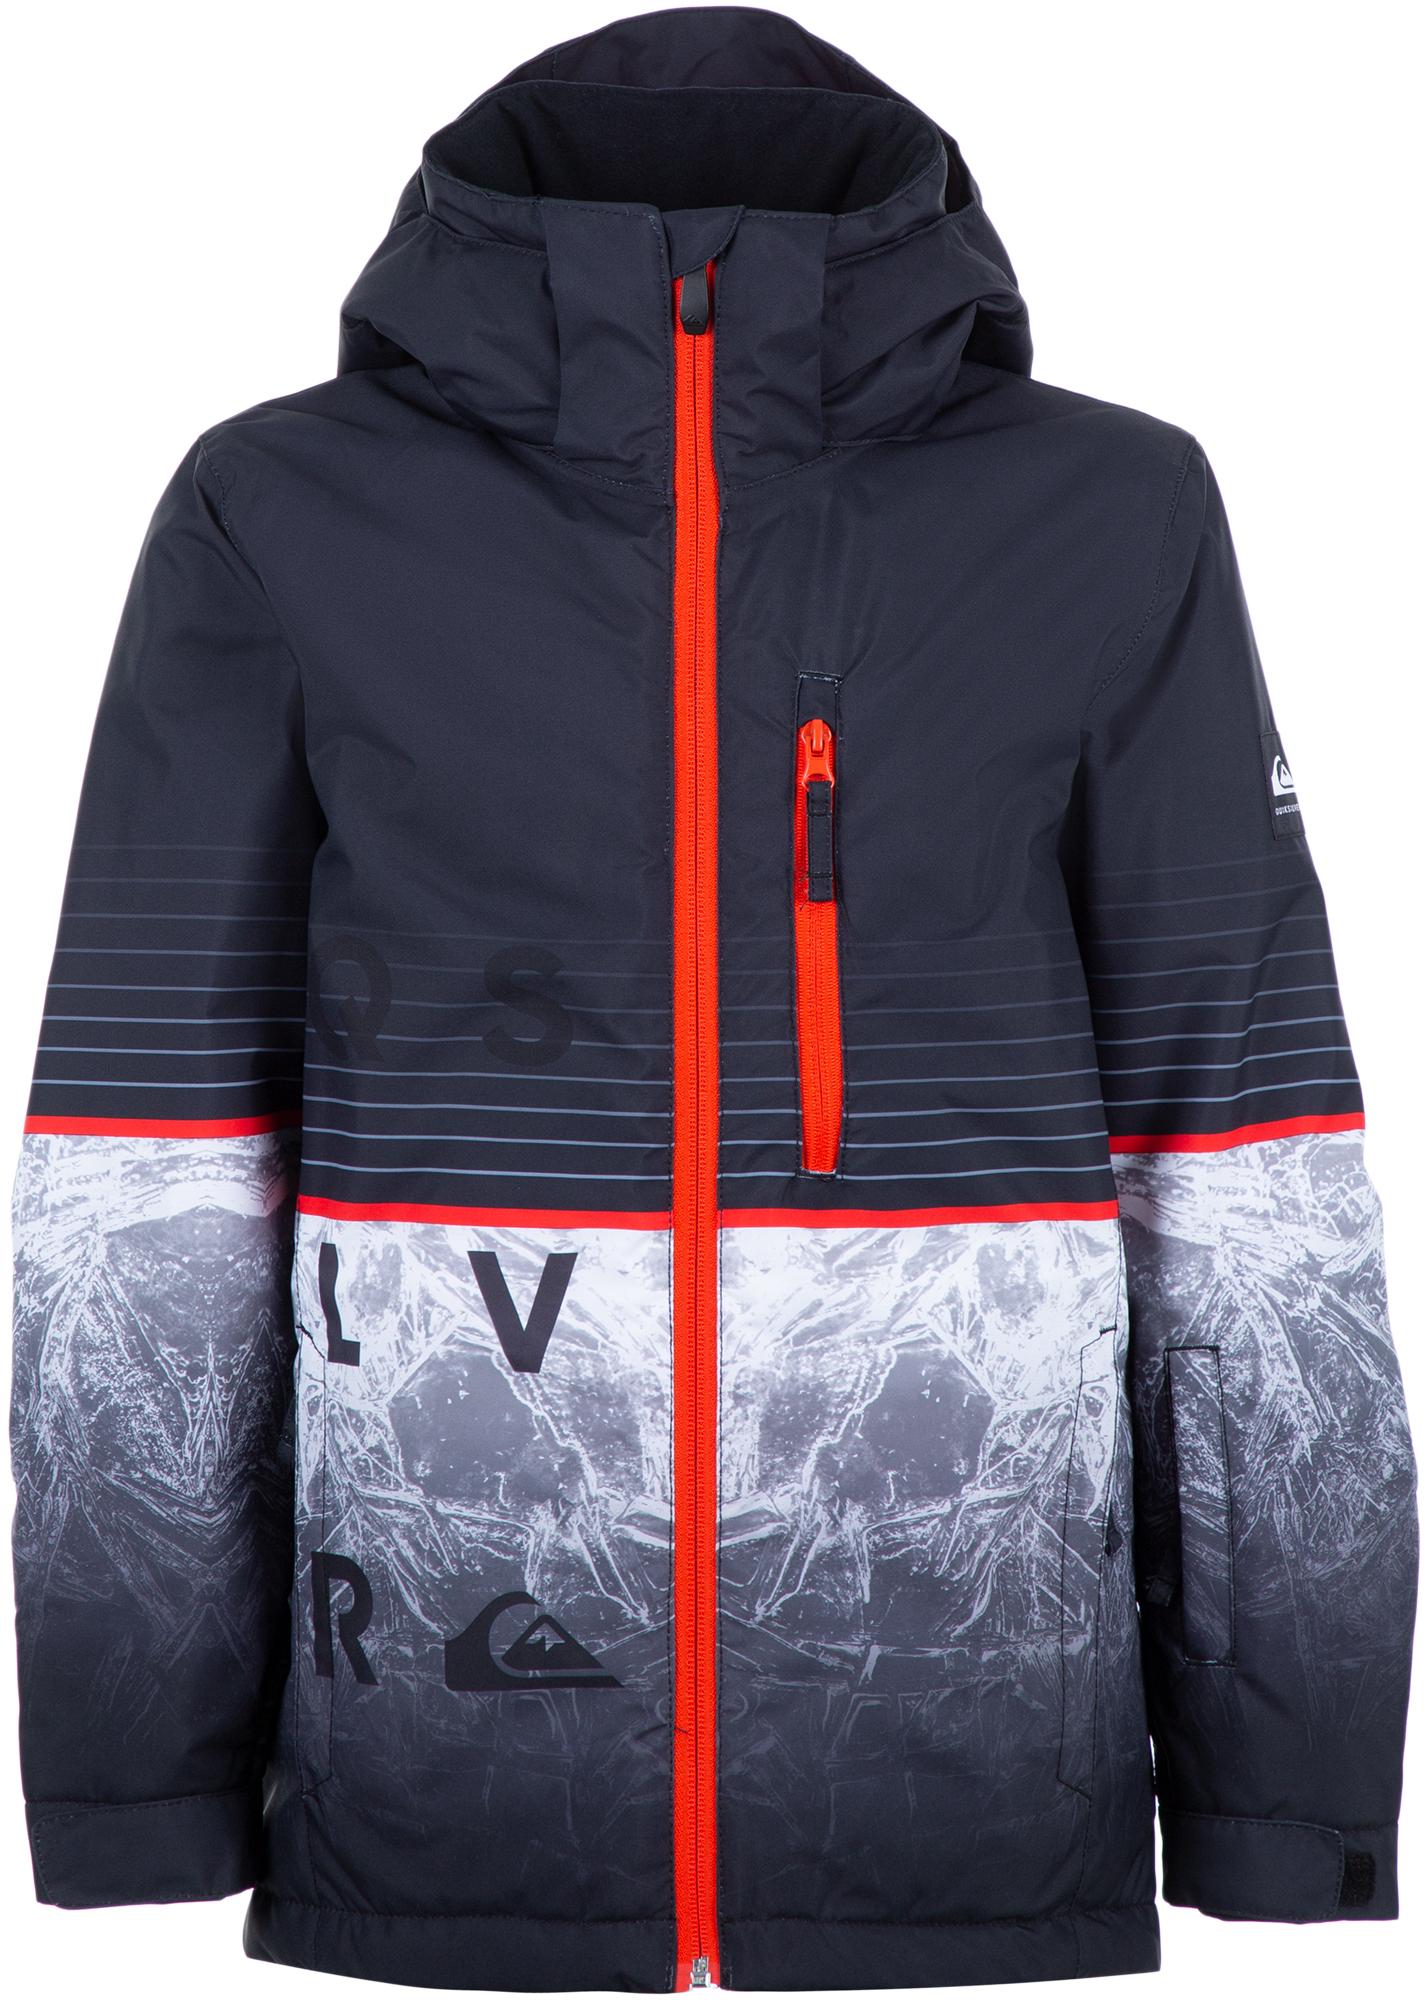 Quiksilver Куртка утепленная для мальчиков Silvertip Youth, размер 164-170